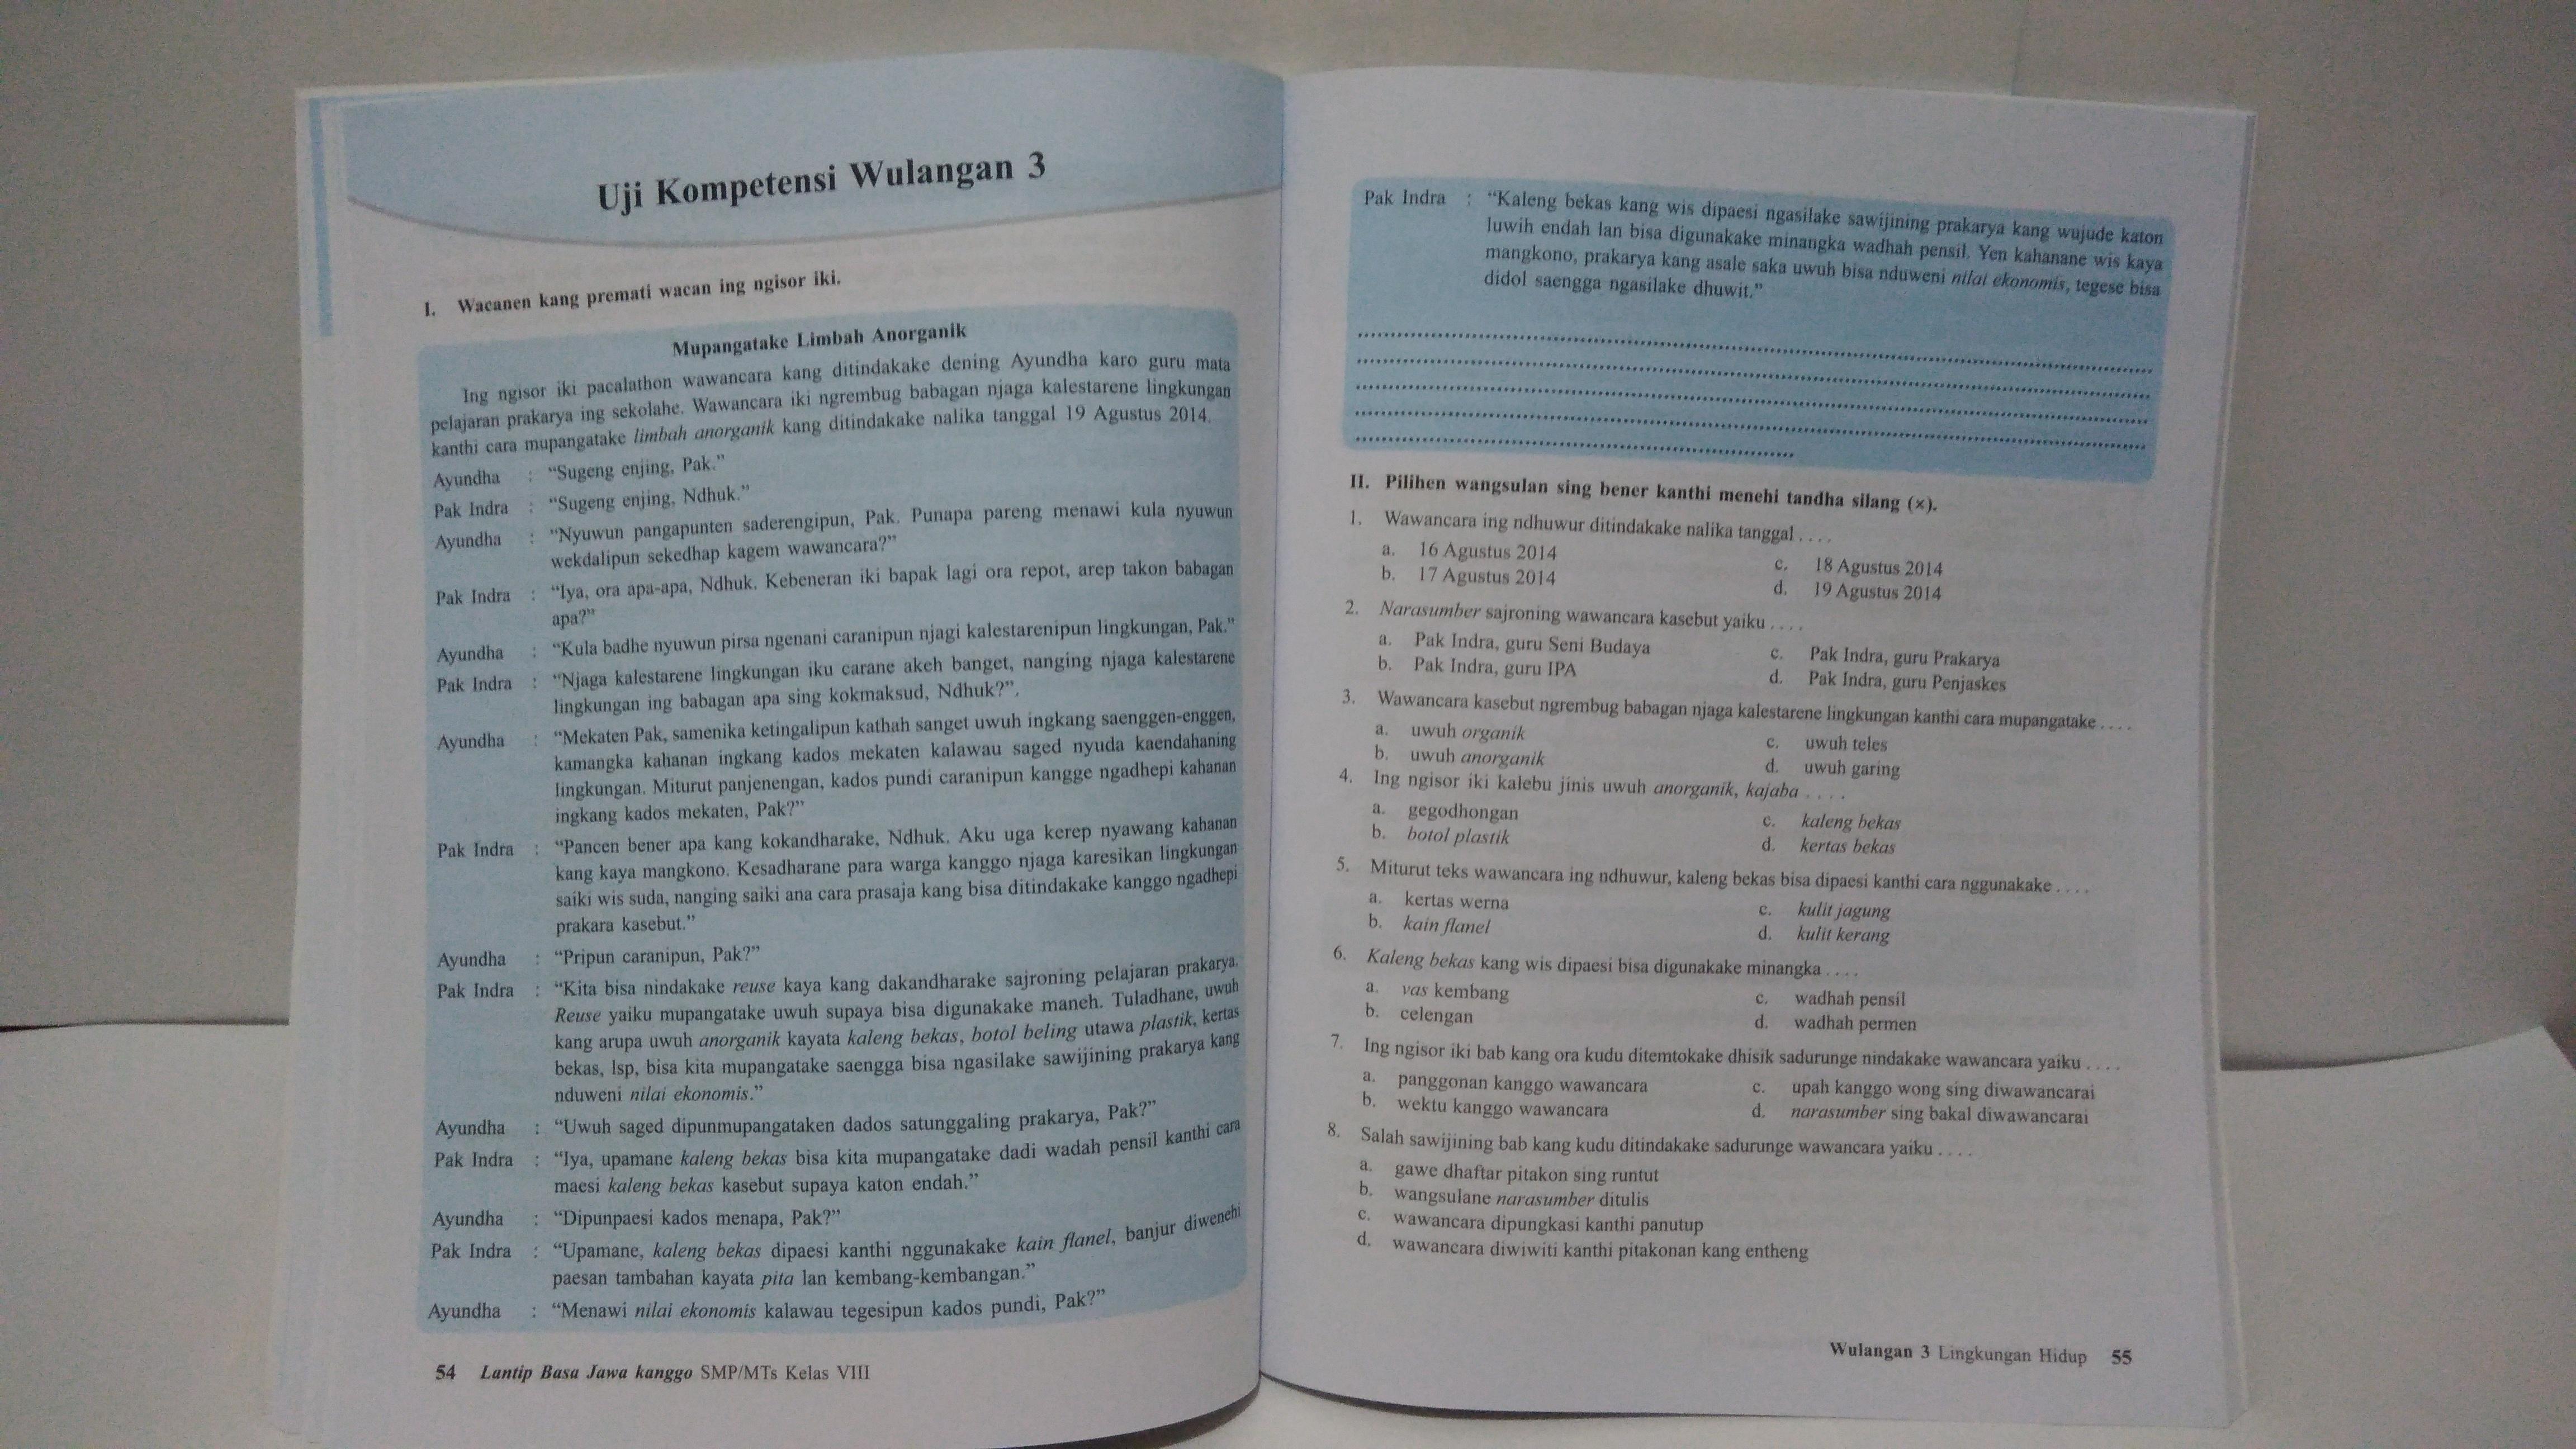 Kunci jawaban buku tantri basa kelas 5 hal 100 guru ilmu sosial. Kunci Jawaban Bahasa Sunda Kelas 5 Halaman 13 View Kunci Jawaban Bahasa Sunda Kelas 5 Halaman 13 Terupdate Malaysia News 13